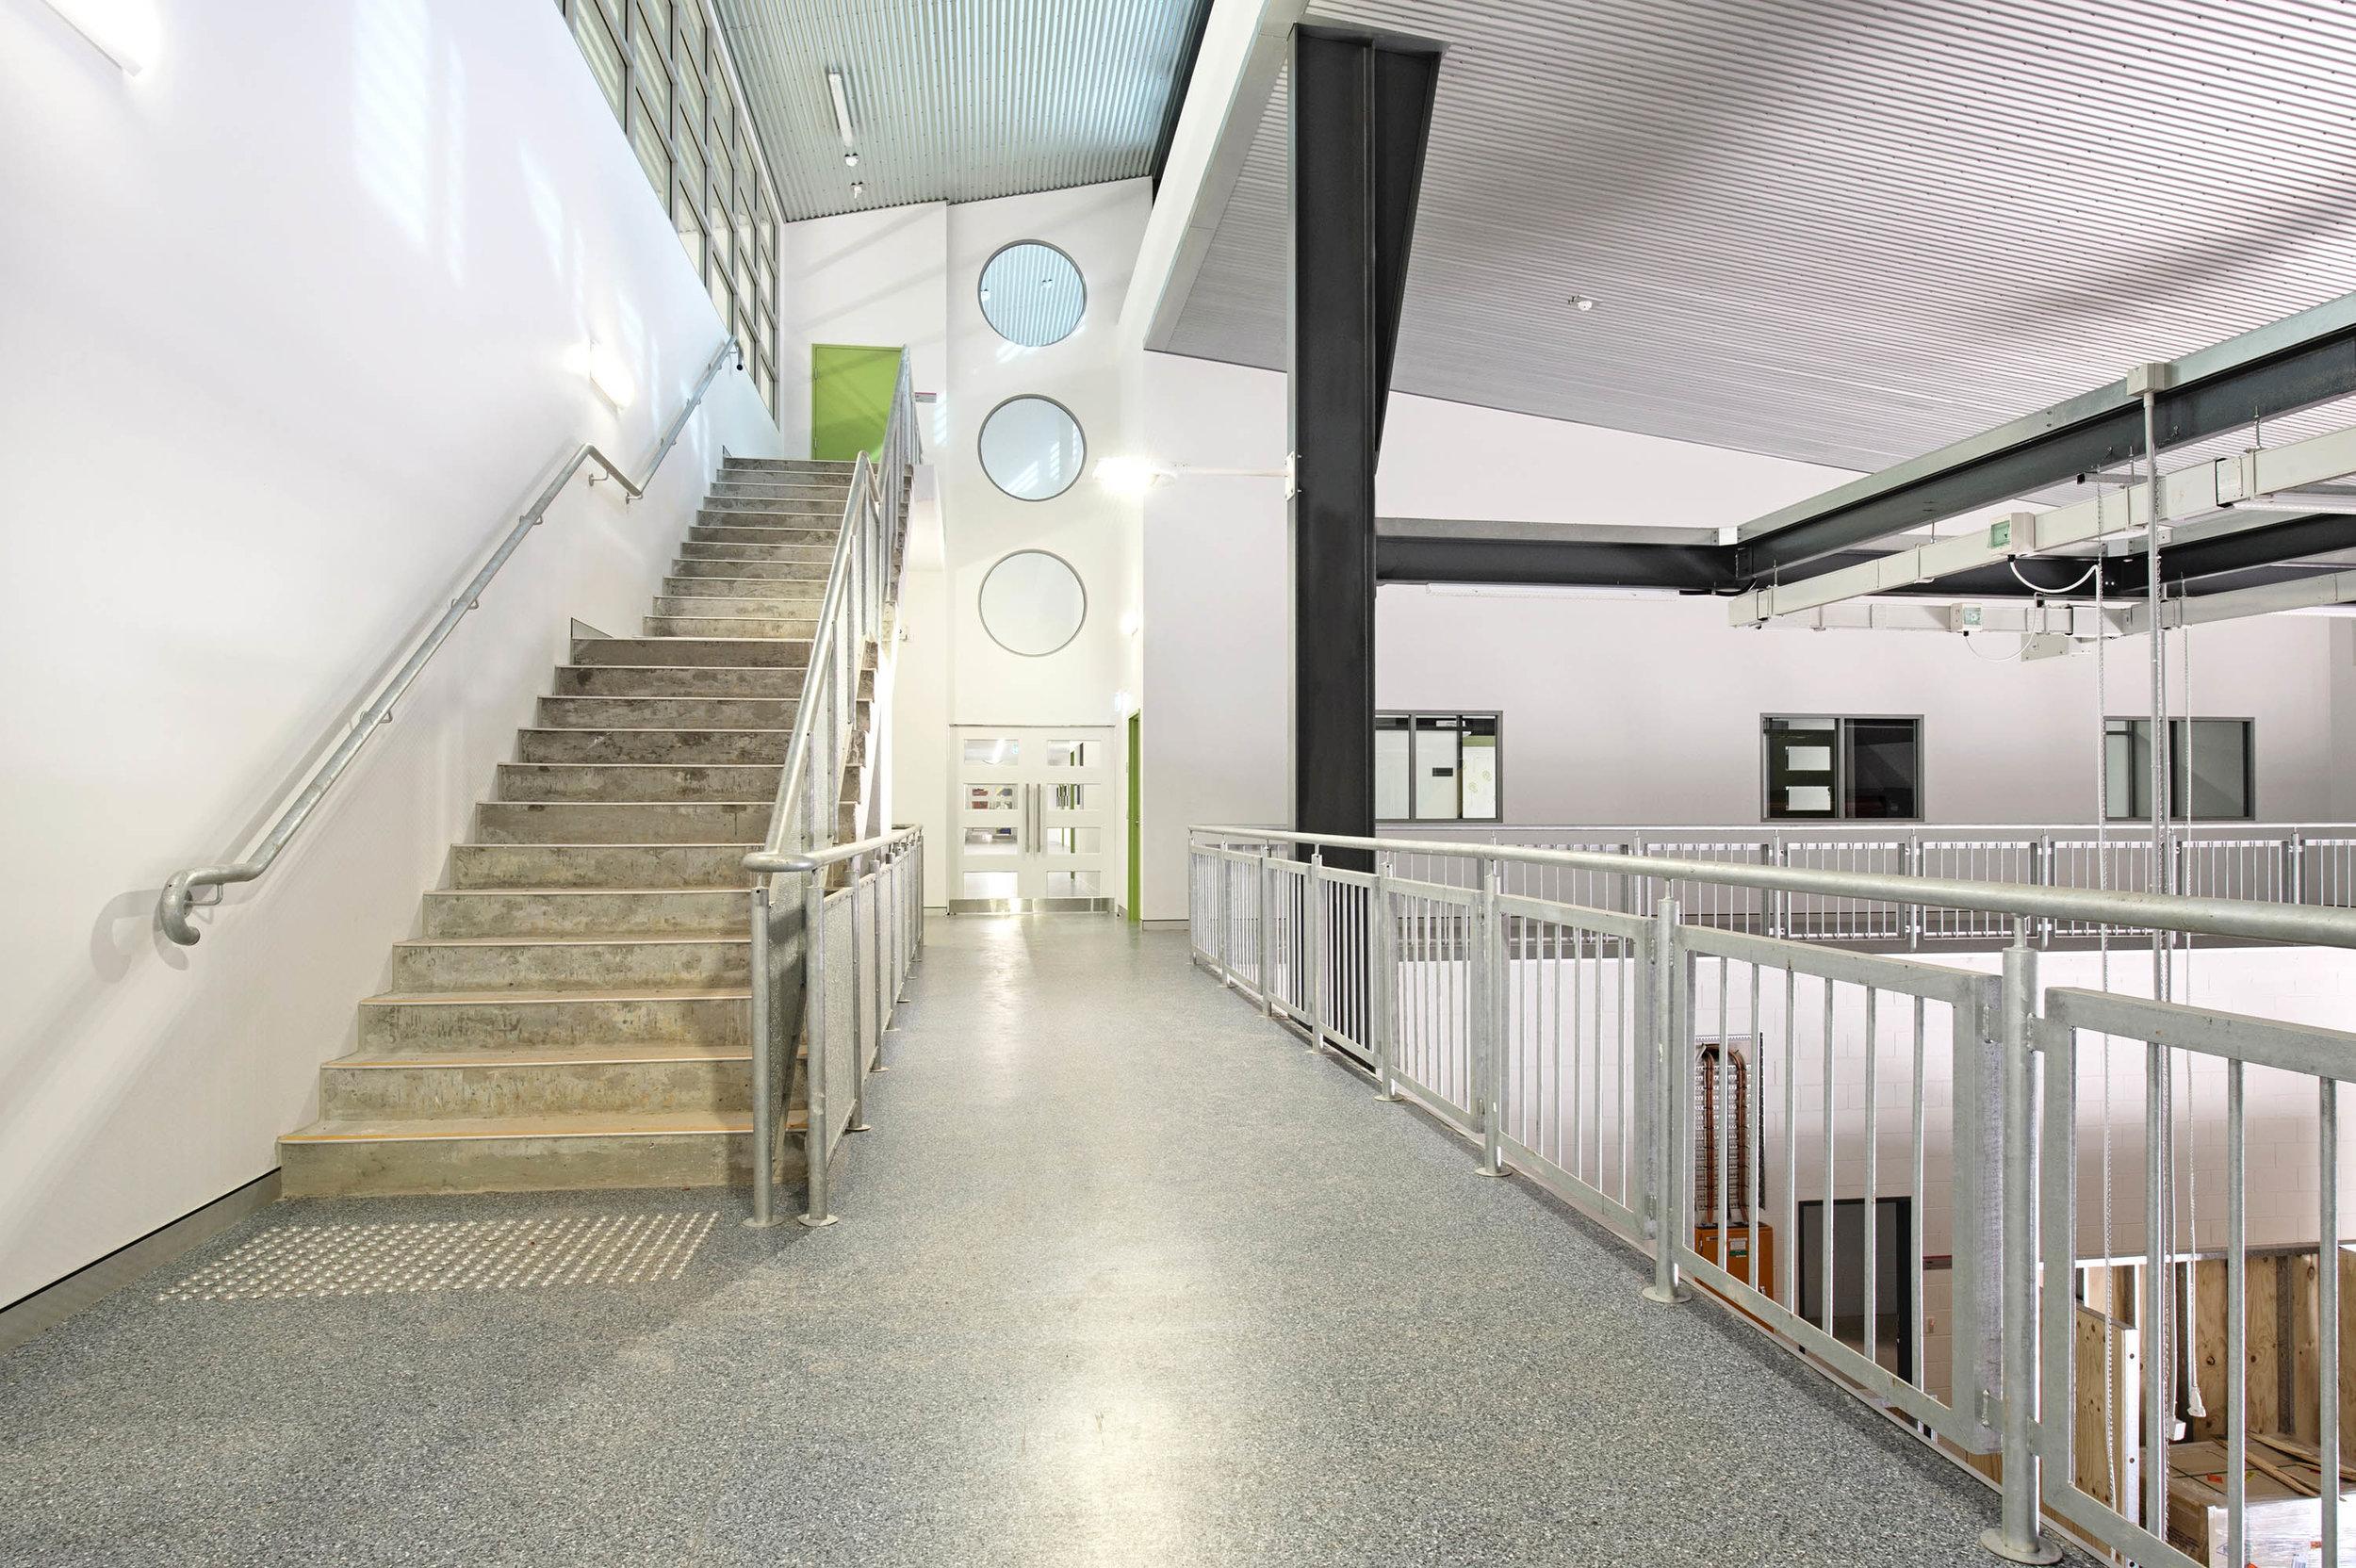 11_MODE_CDU Training Centre Interior_Shaana McNaught_LOWRES.jpg